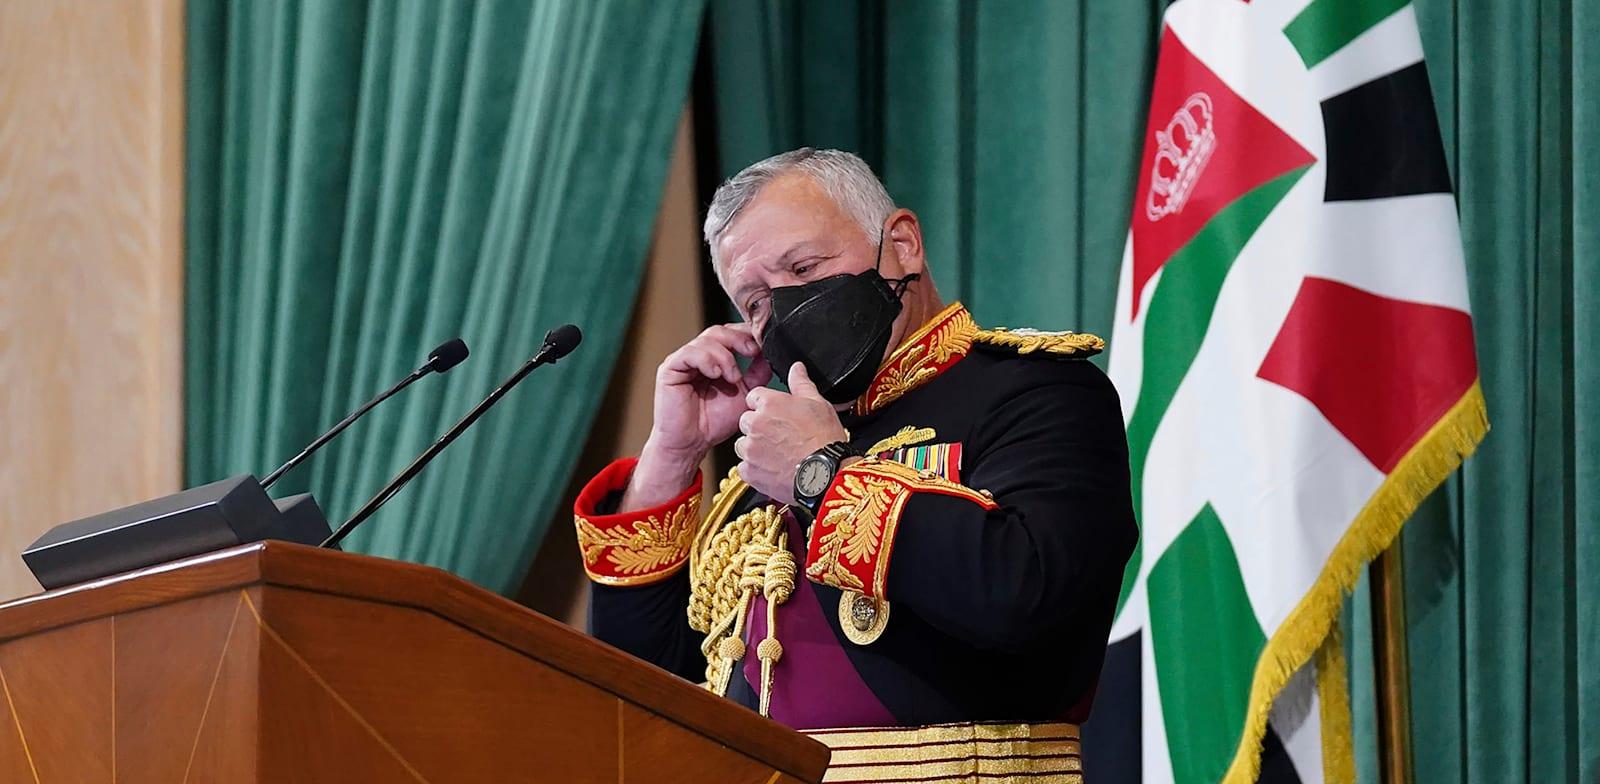 עבדאללה מלך ירדן / צילום: Associated Press, Yousef Allan/The Royal Hashemite Court